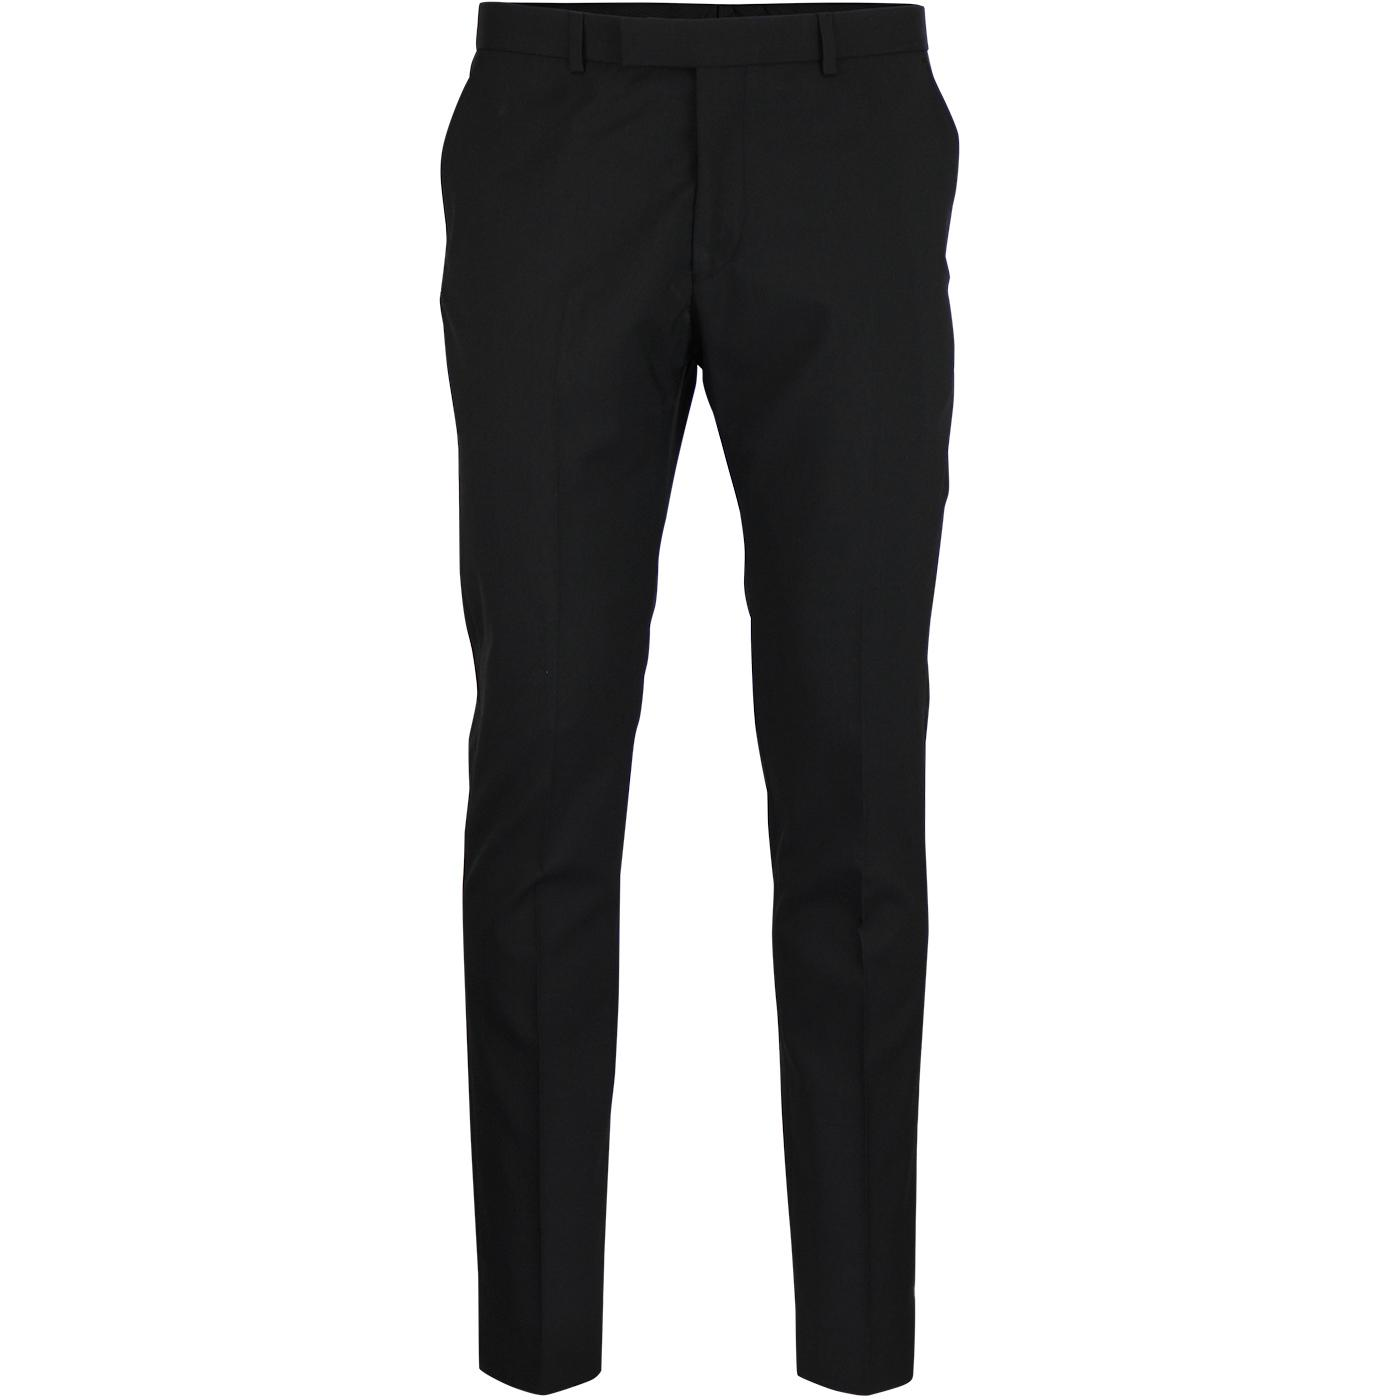 BEN SHERMAN Men's Mod Tonic Suit Trousers (Black)